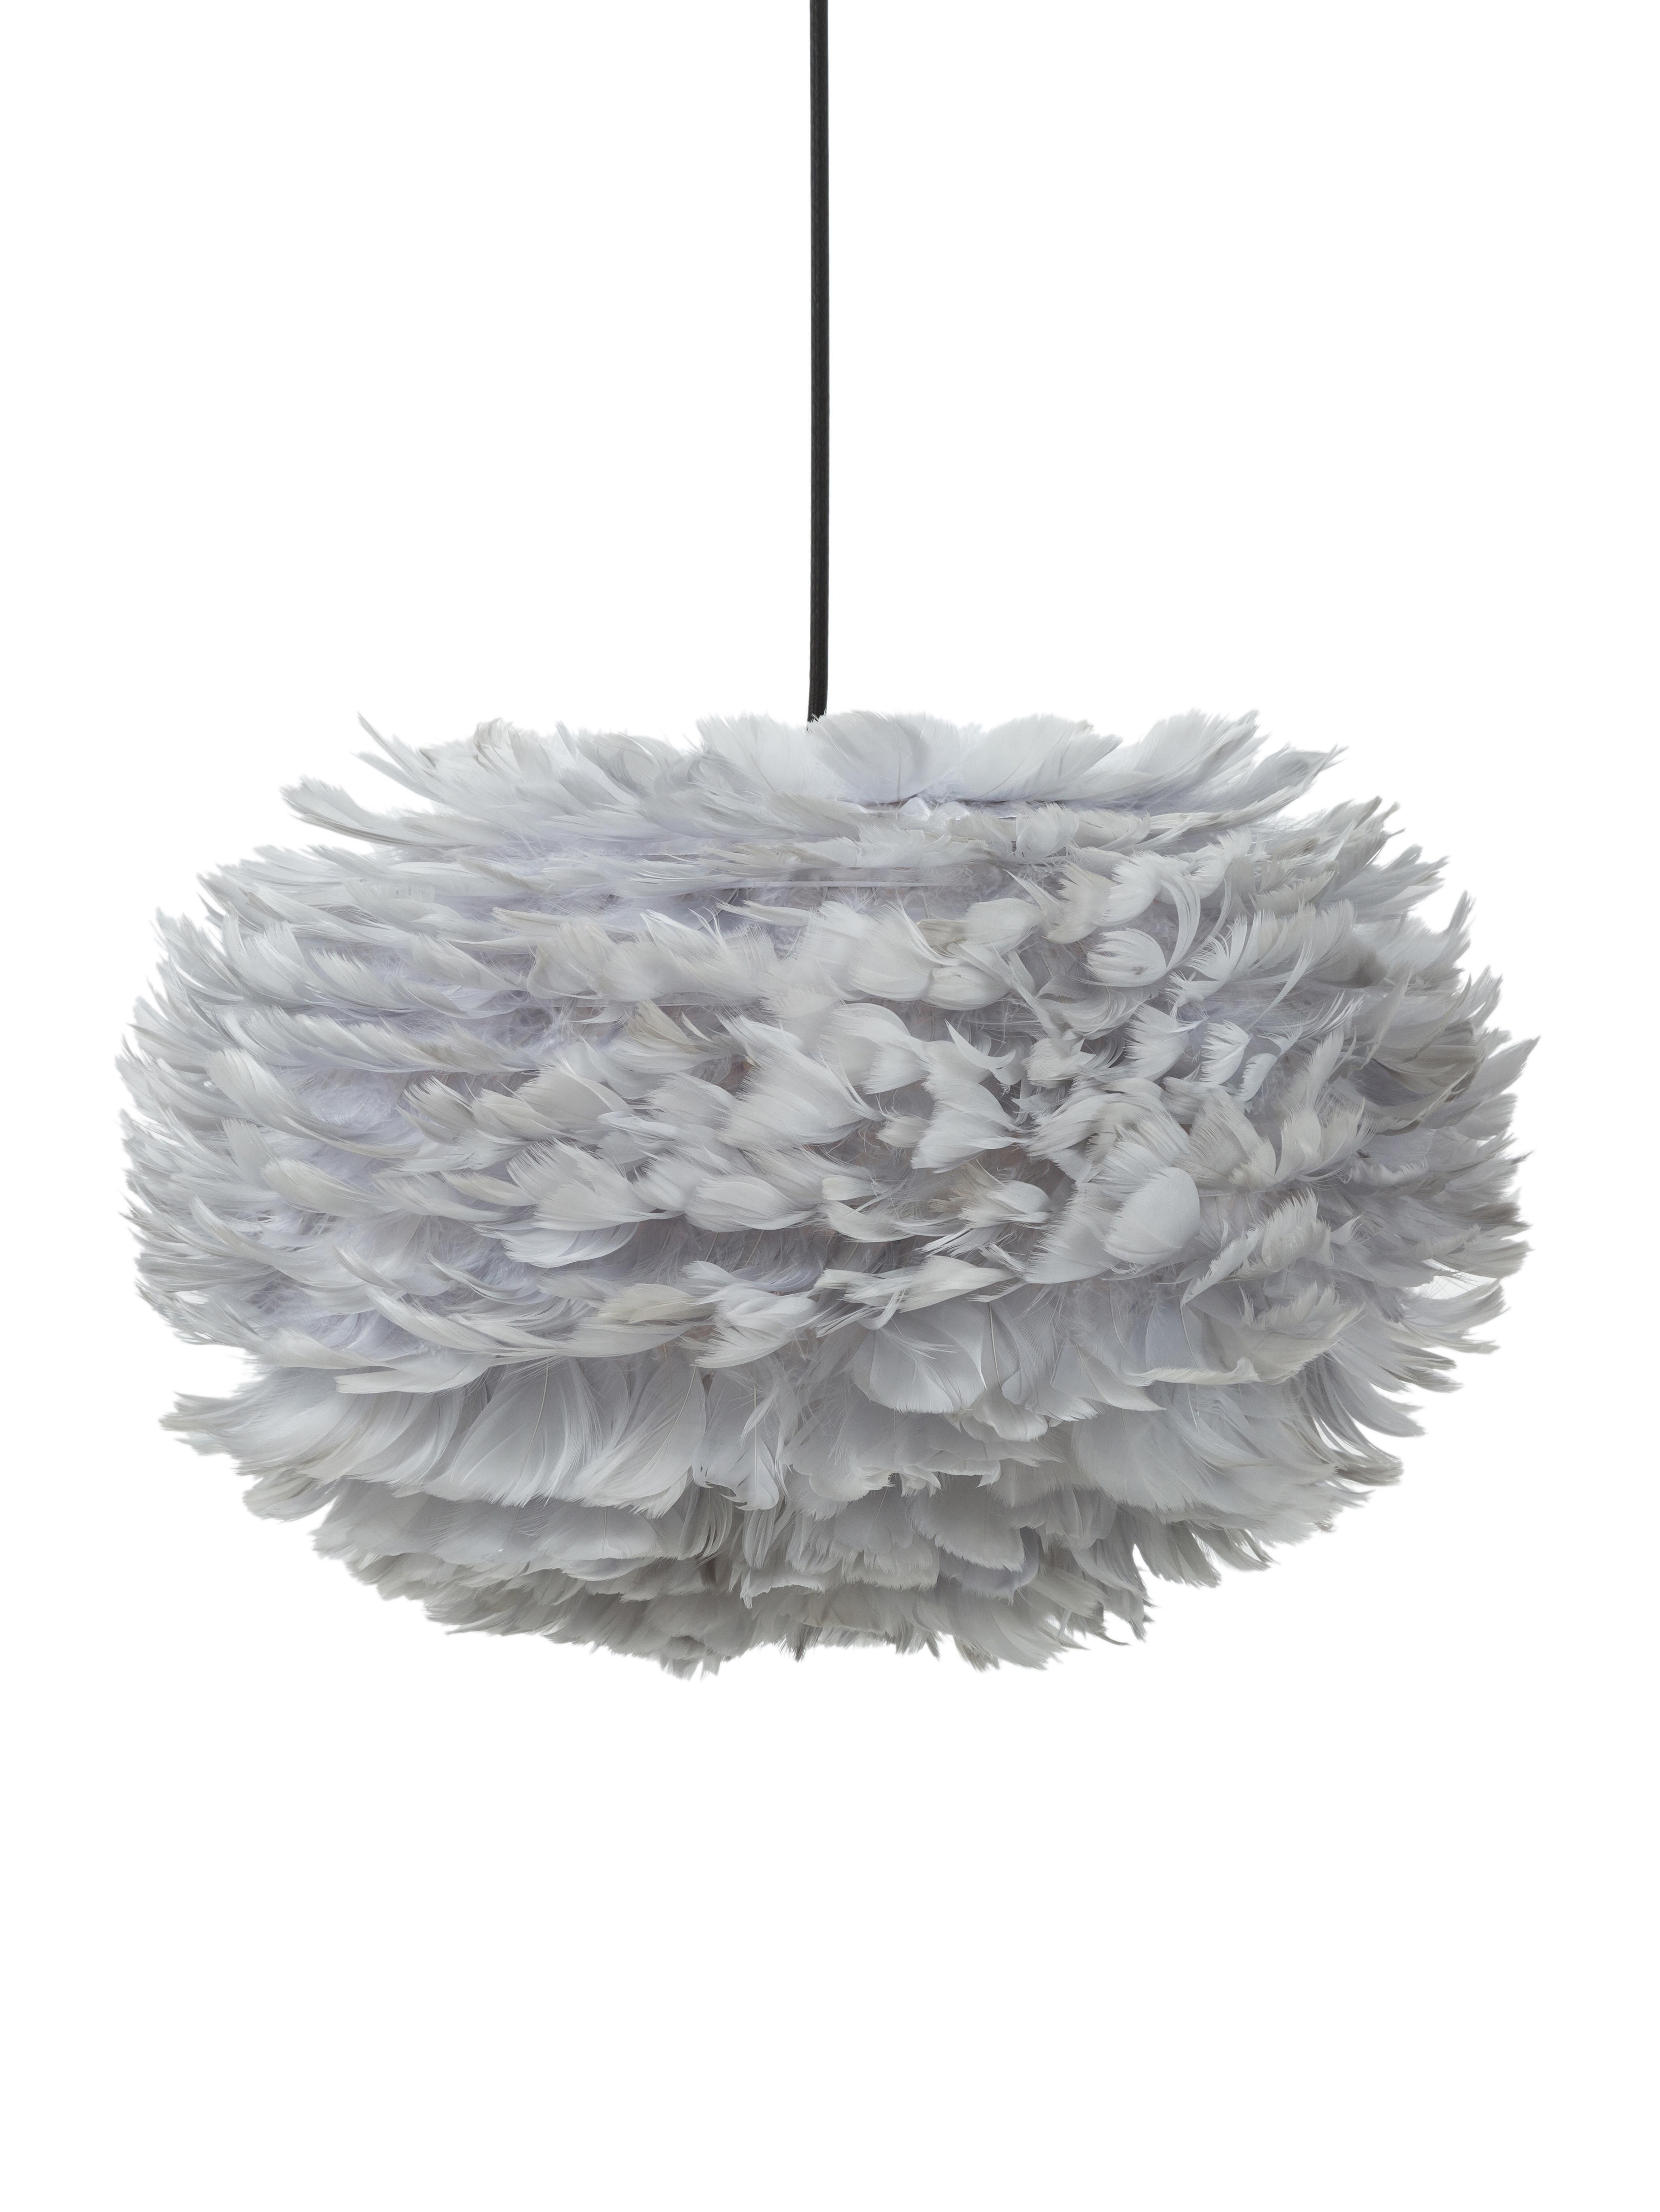 Lampada a sospensione in piume Eos, Paralume: piuma d'oca, acciaio, Baldacchino: materiale sintetico, Grigio chiaro, Ø 45 x Alt. 30 cm